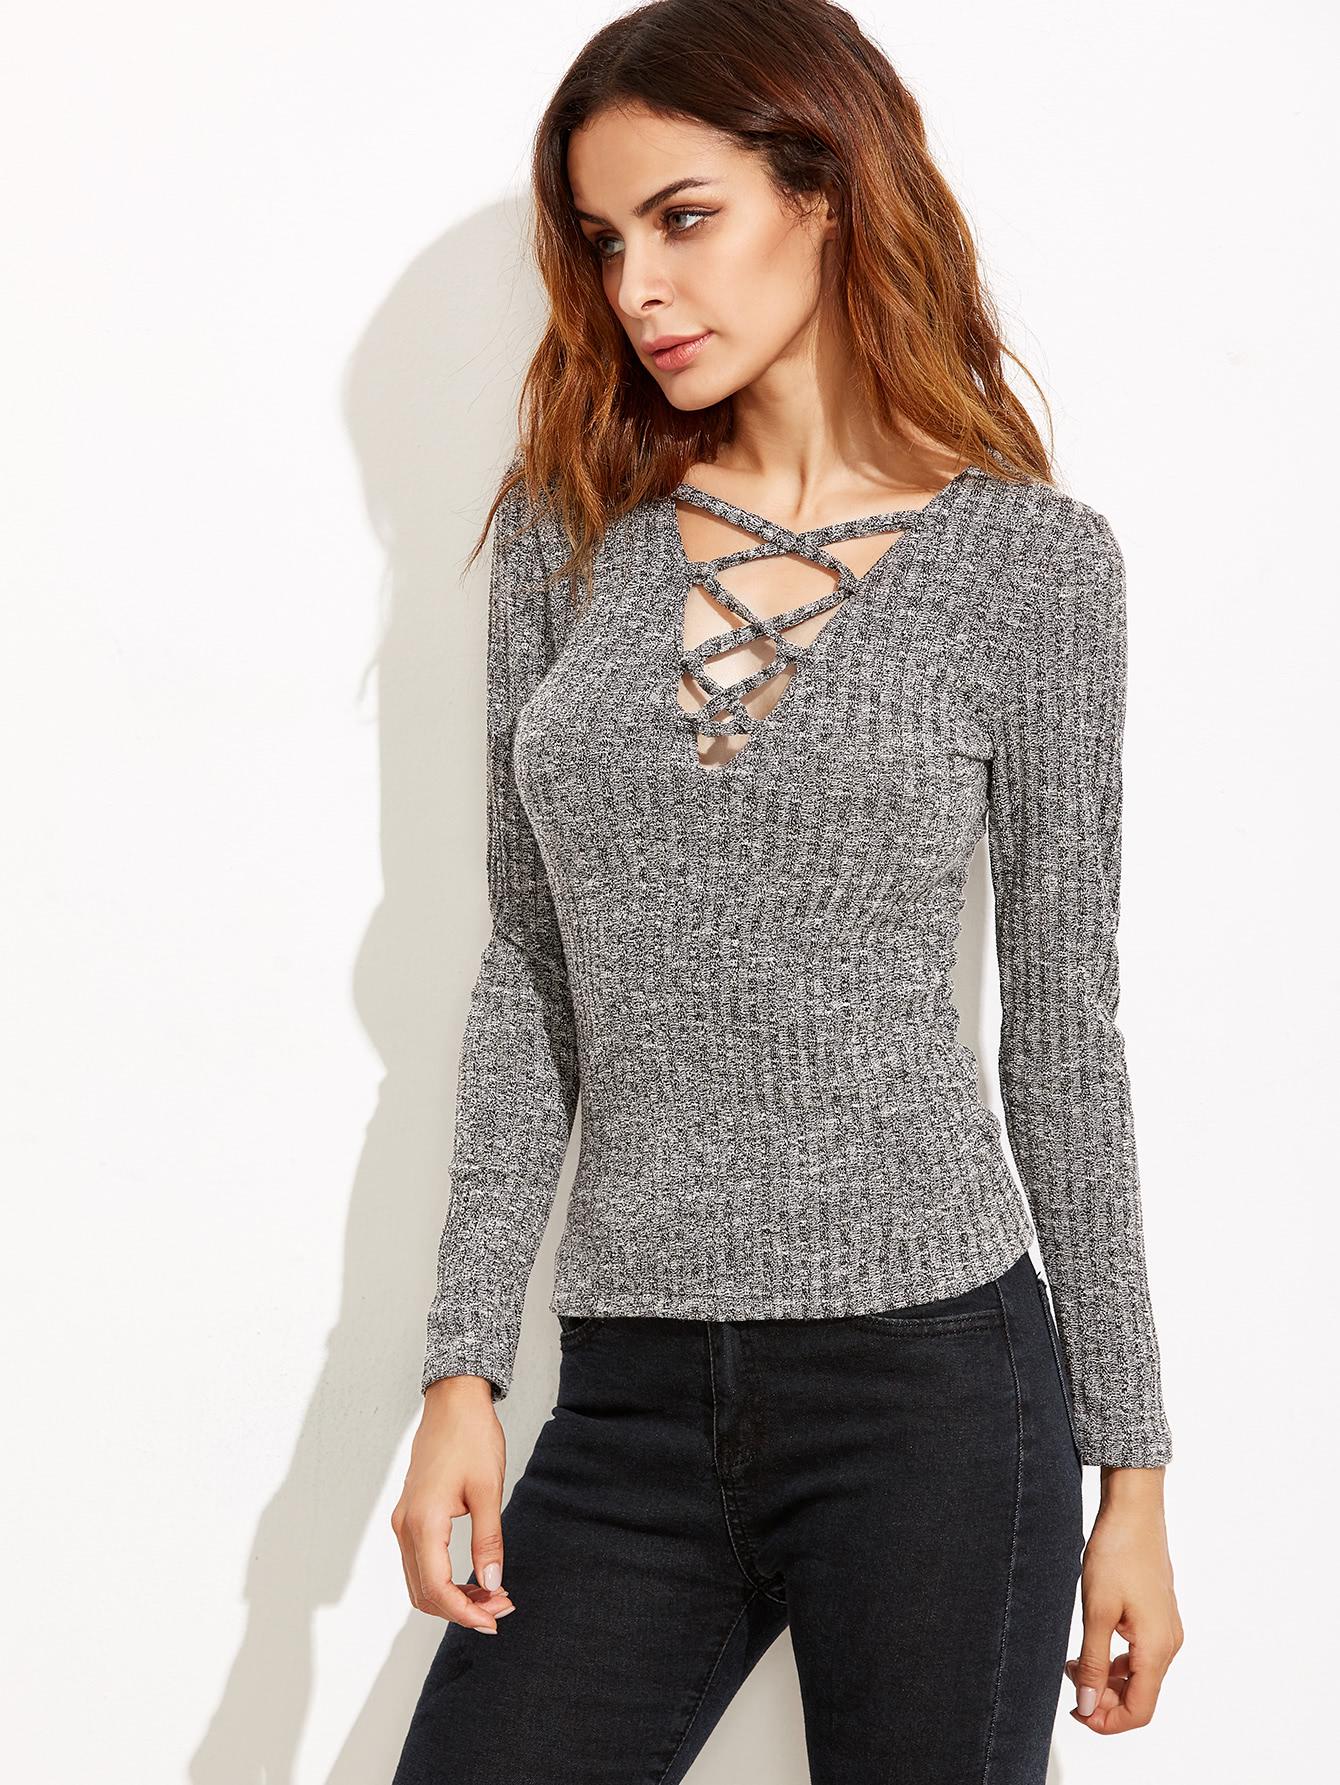 Plunge Crisscross Marled Knit Ribbed T-shirt RTSH160905111